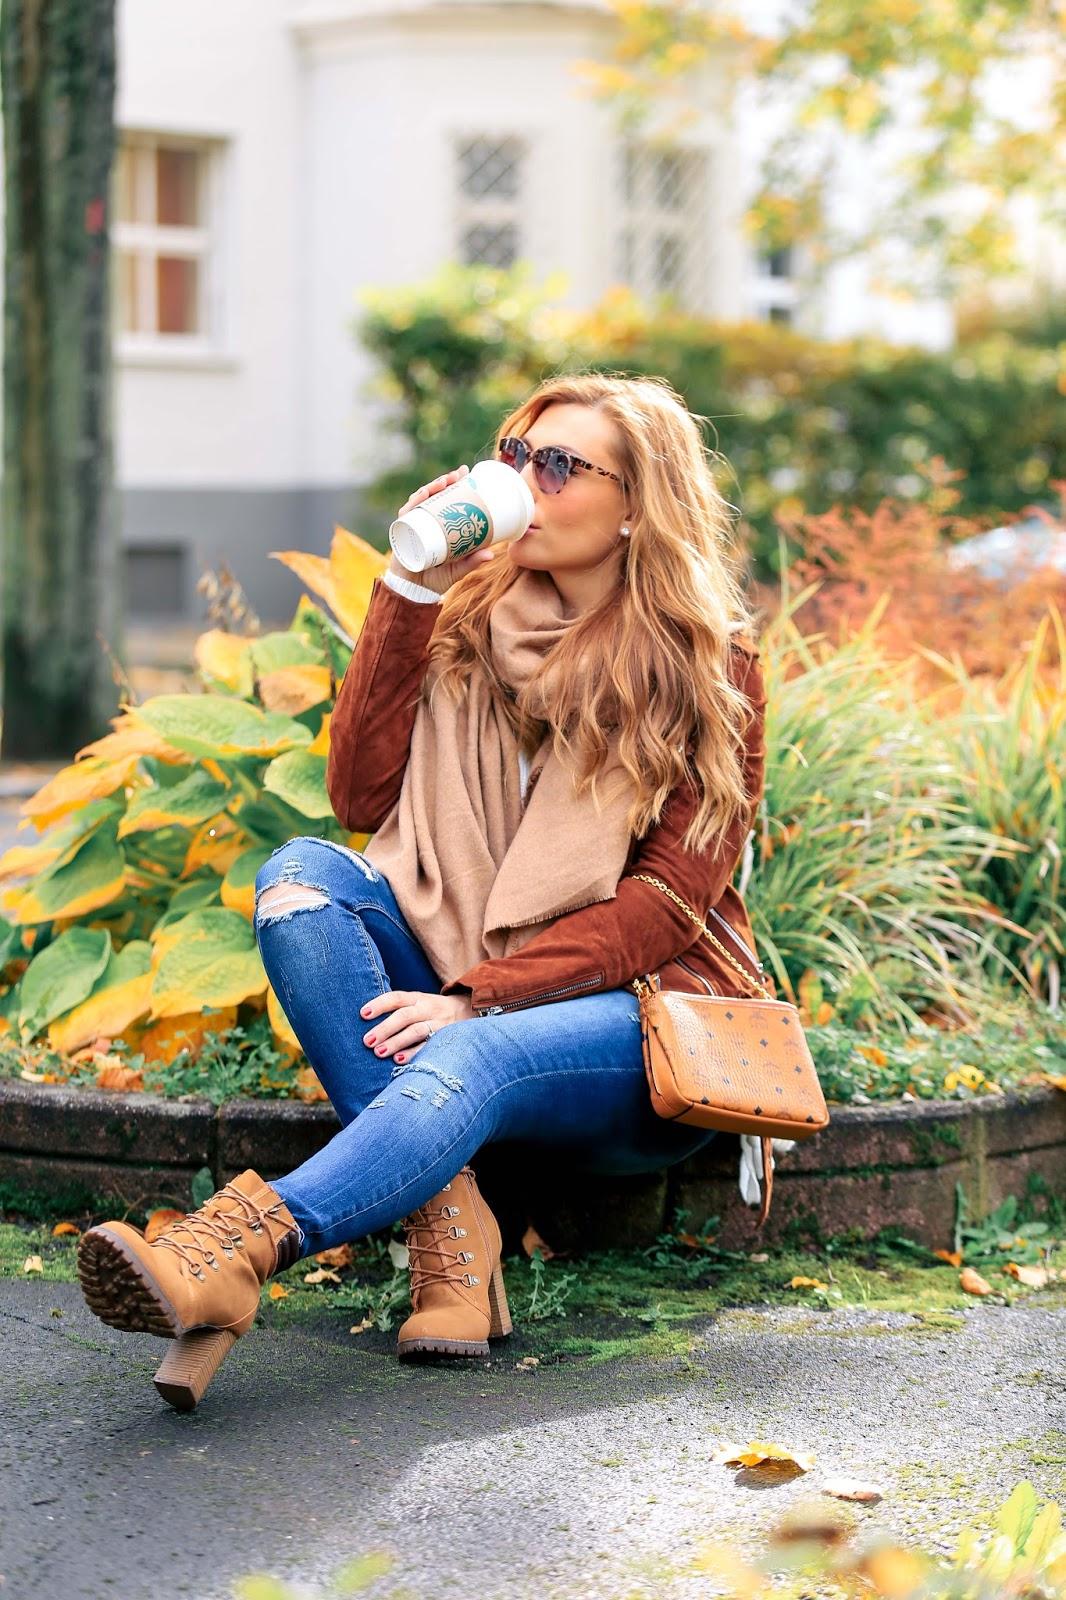 Braune-lederjacke-Fashionstylebyjohanna-blogger-Frankfurt-deutschlandfashionblog-outfit-ootd-pumps-hmtrend-beige-altrosa-oversize-cardigan-khaki-jeans-MCM-Tasche